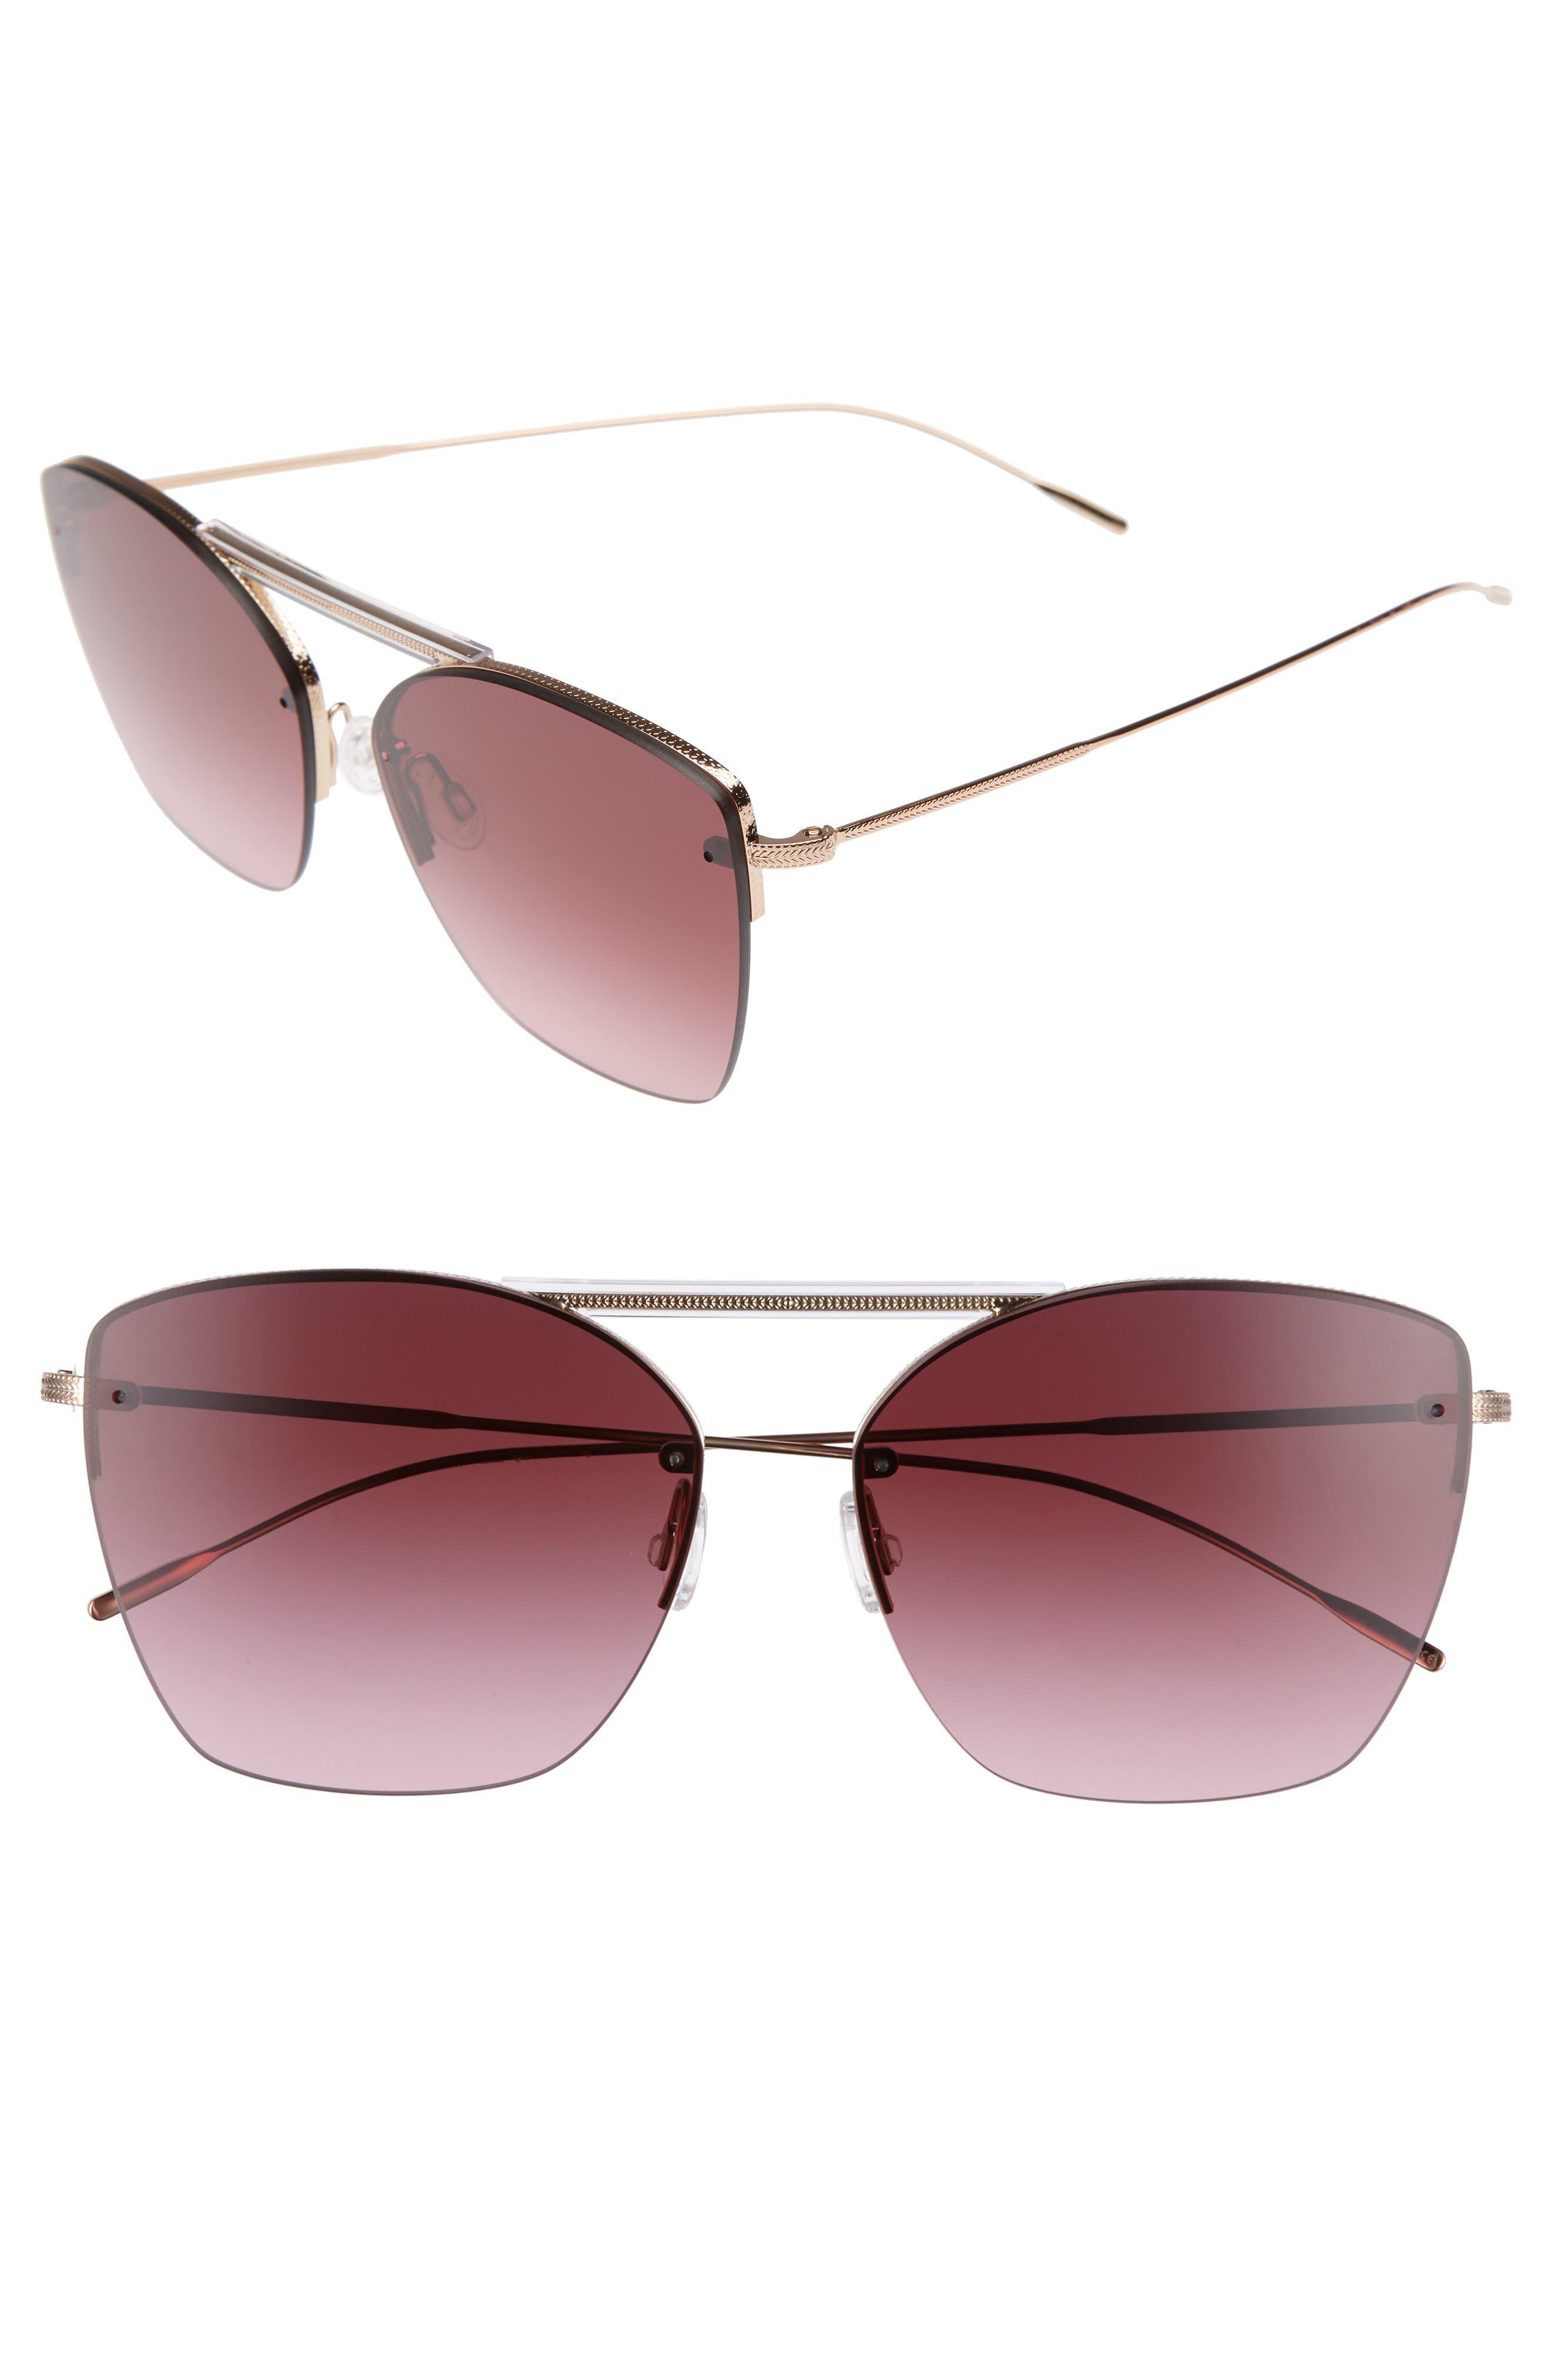 Ziane 61mm Rimless Sunglasses,                         Main,                         color, 650